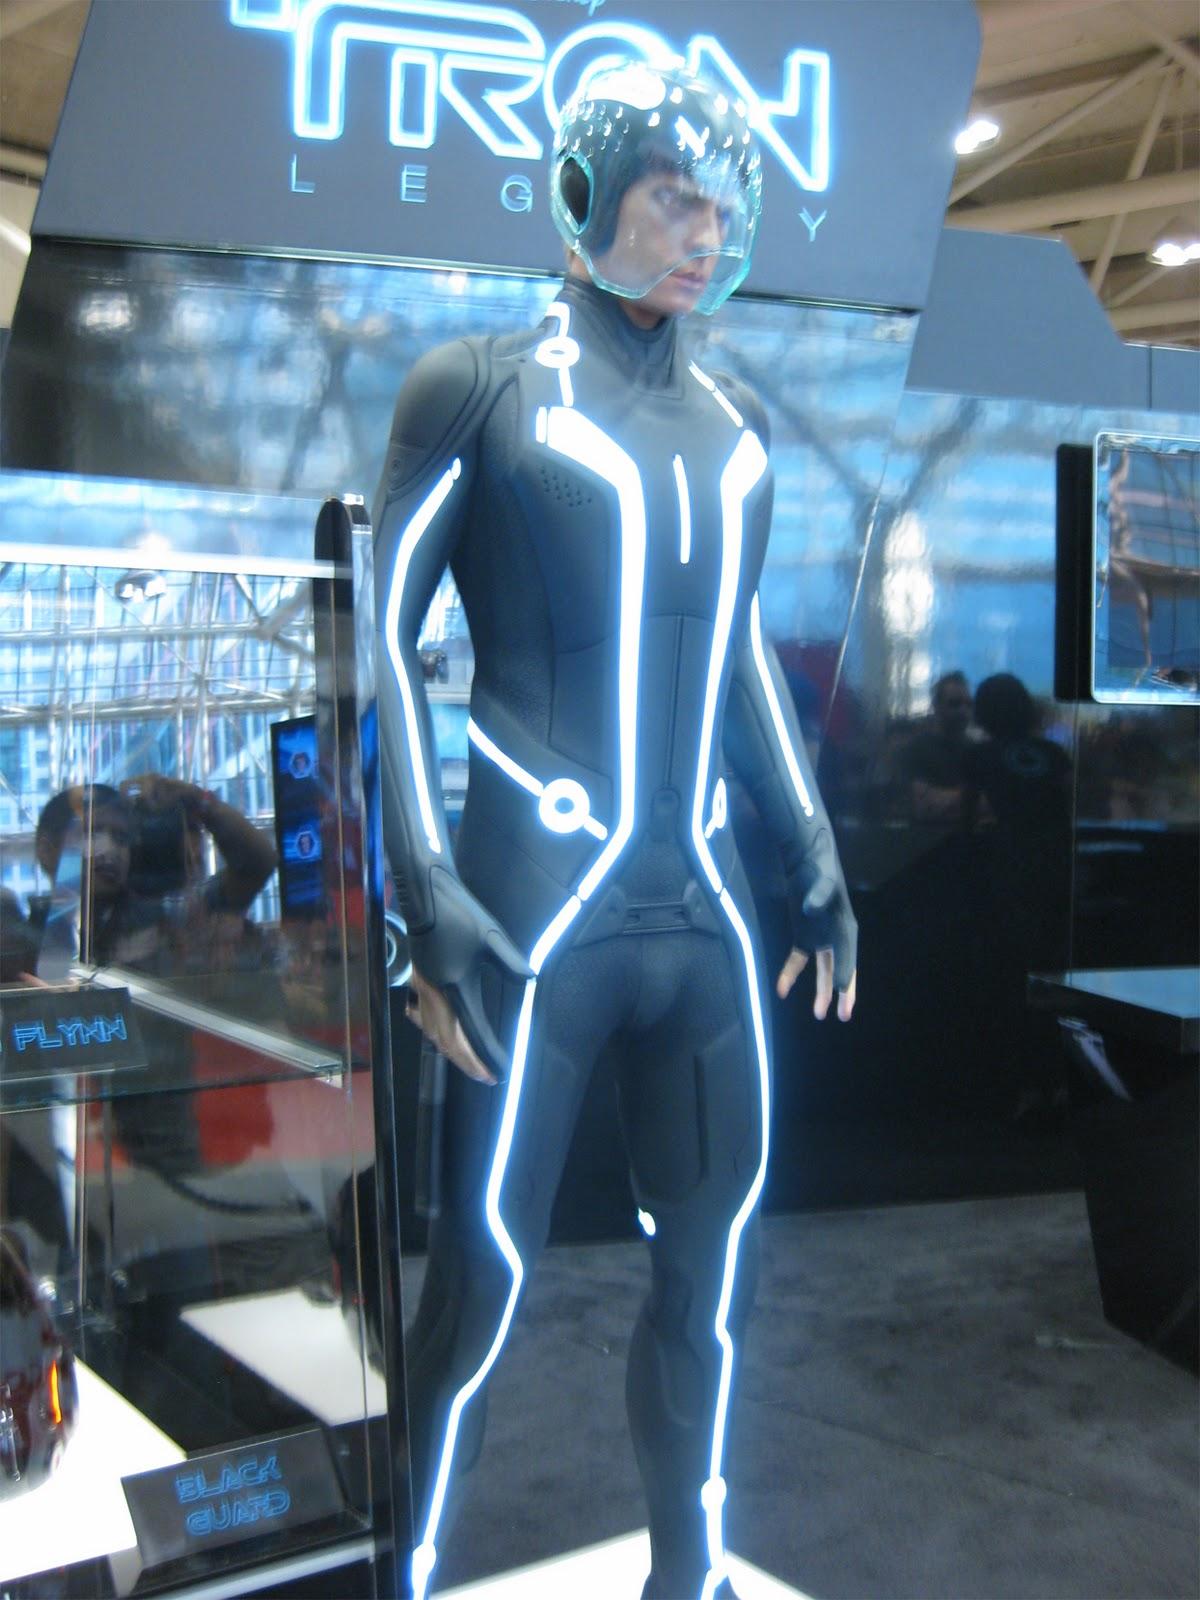 The Gundam Spartan A Canadian Otaku August 2010 & Real Tron Costume - Meningrey